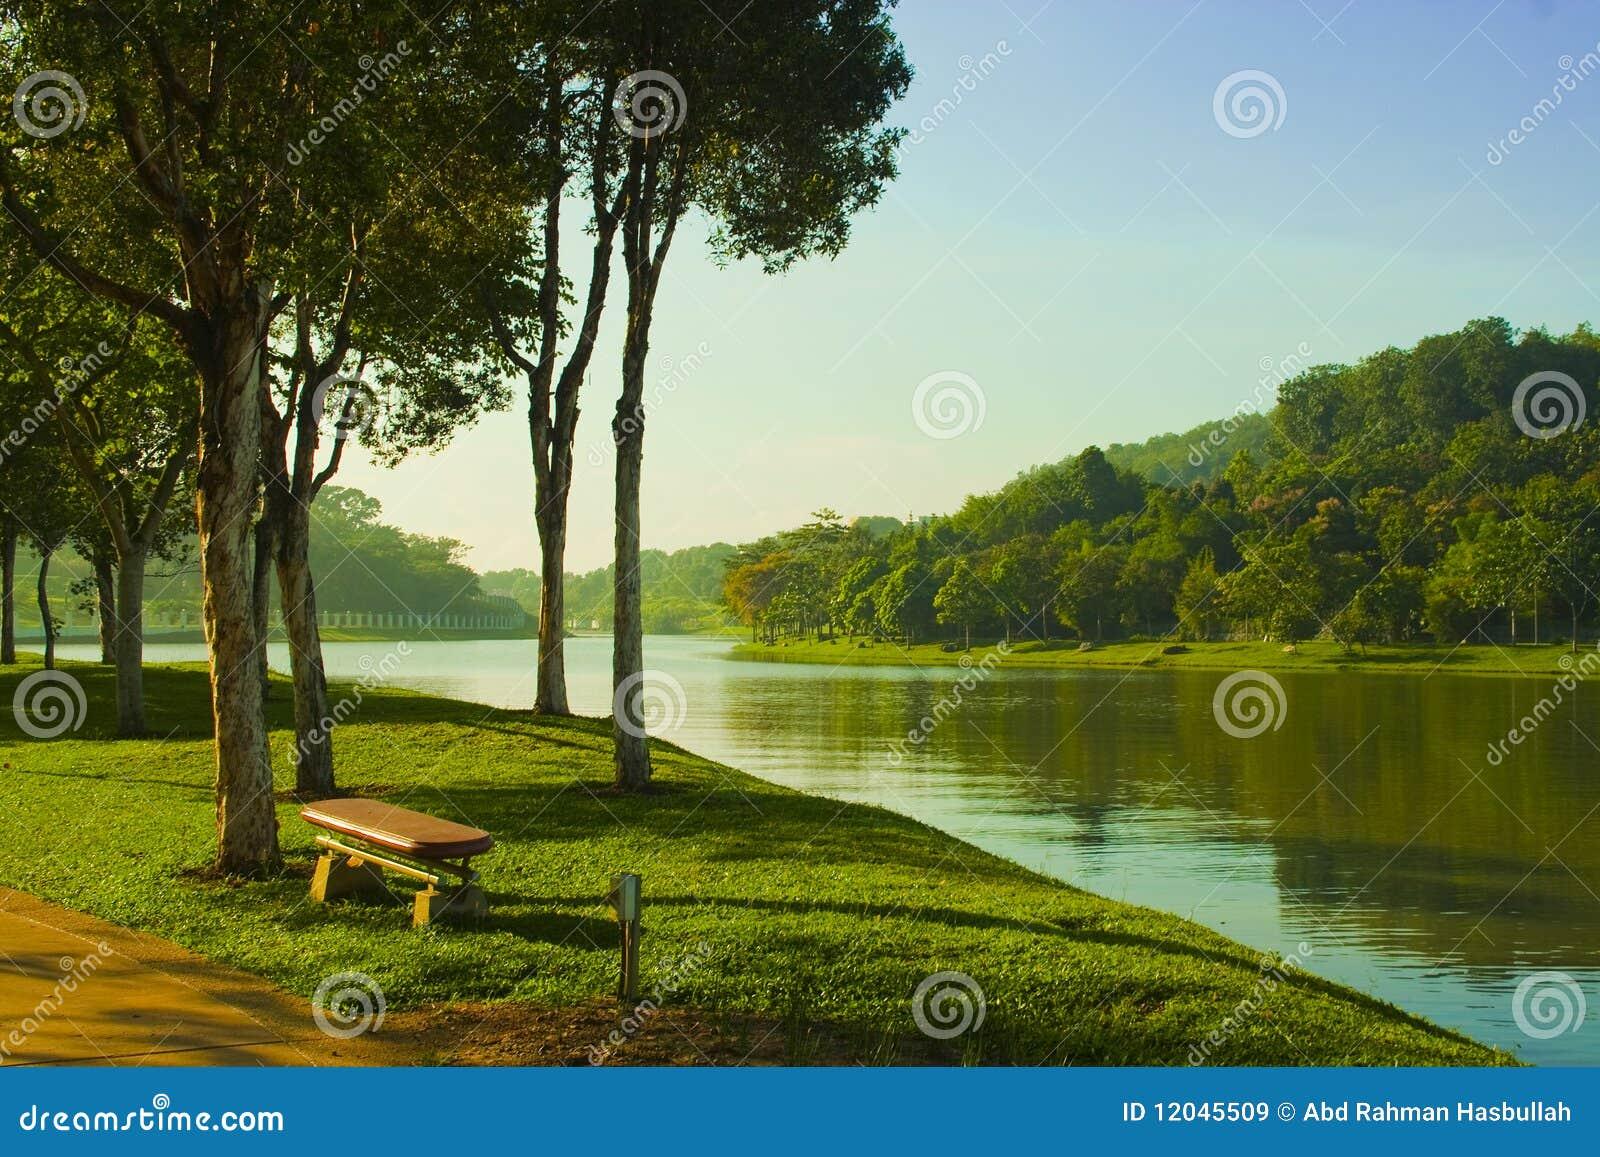 Seeseitepark